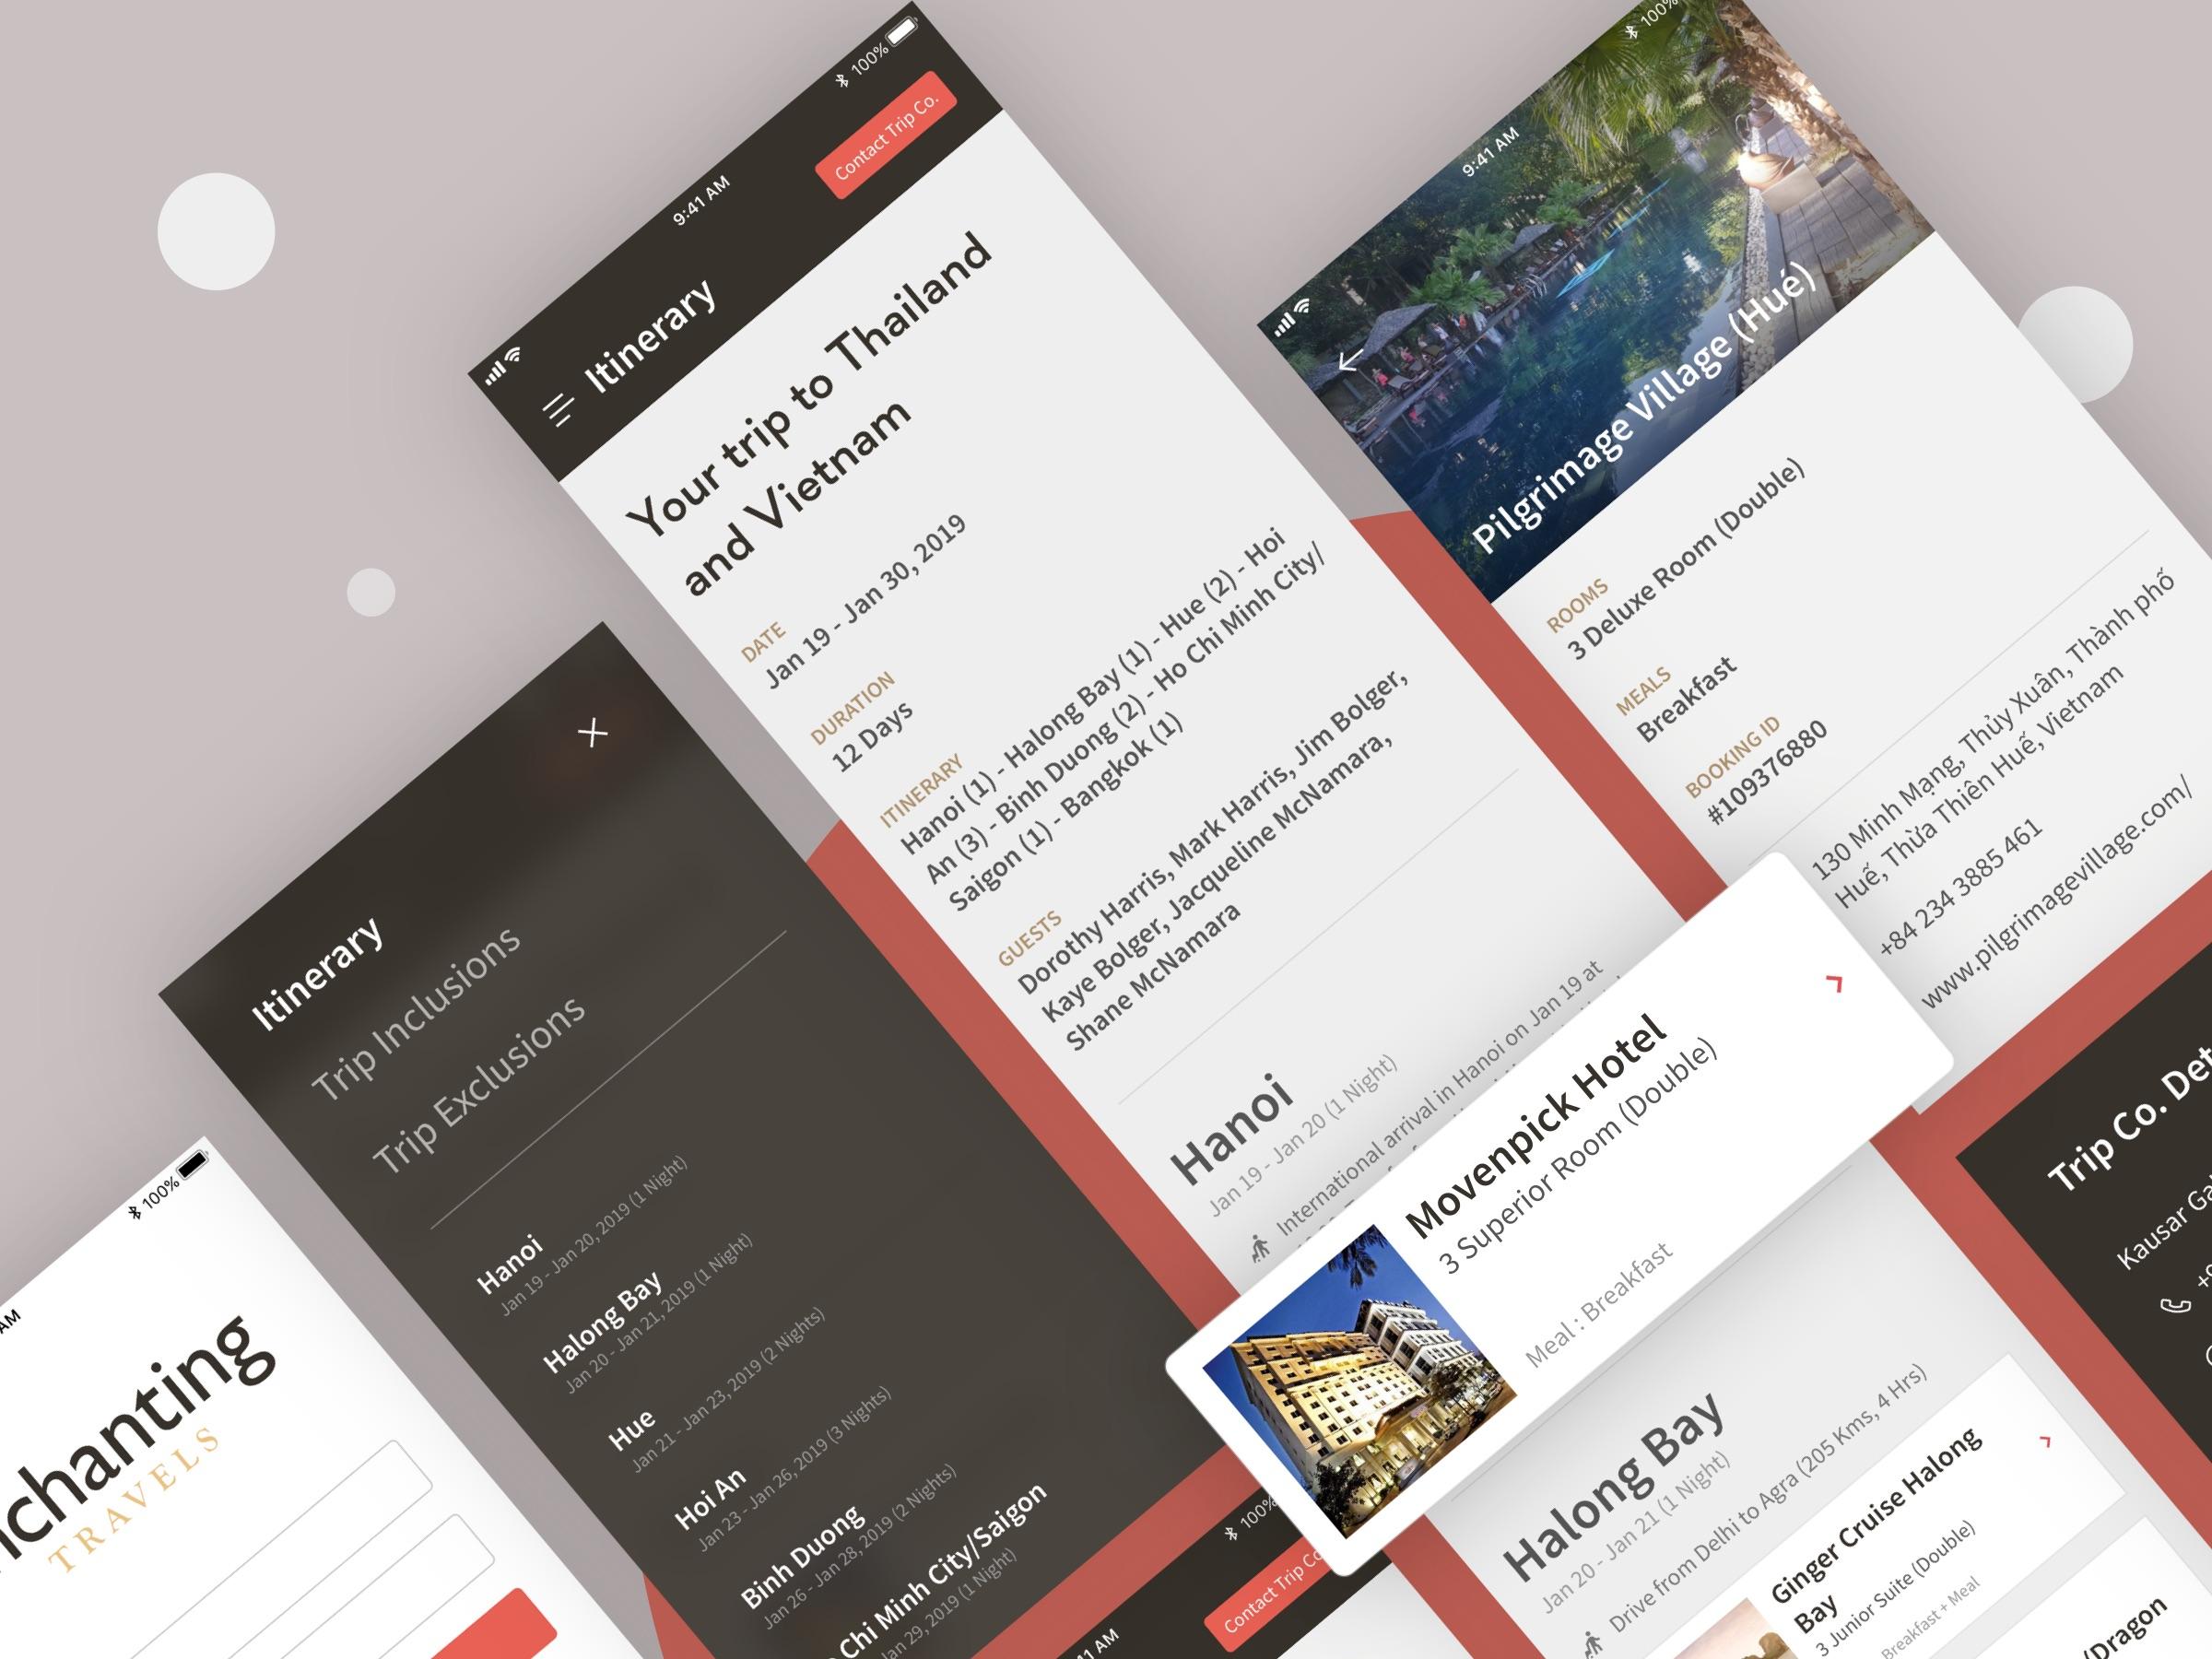 Enchanting travels Design sprint High fidelity mobile screen